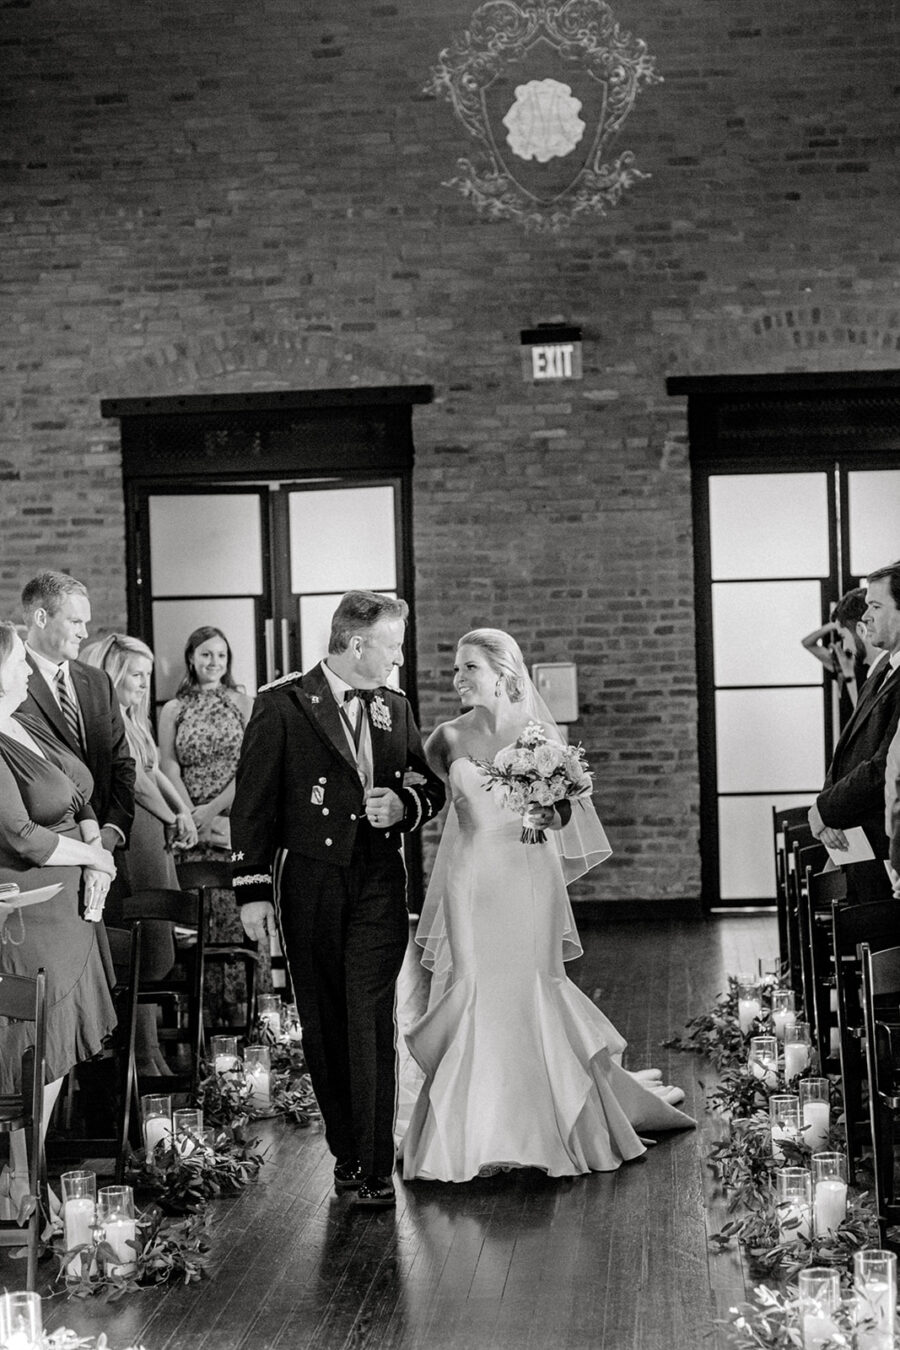 Clementine Nashville wedding ceremony